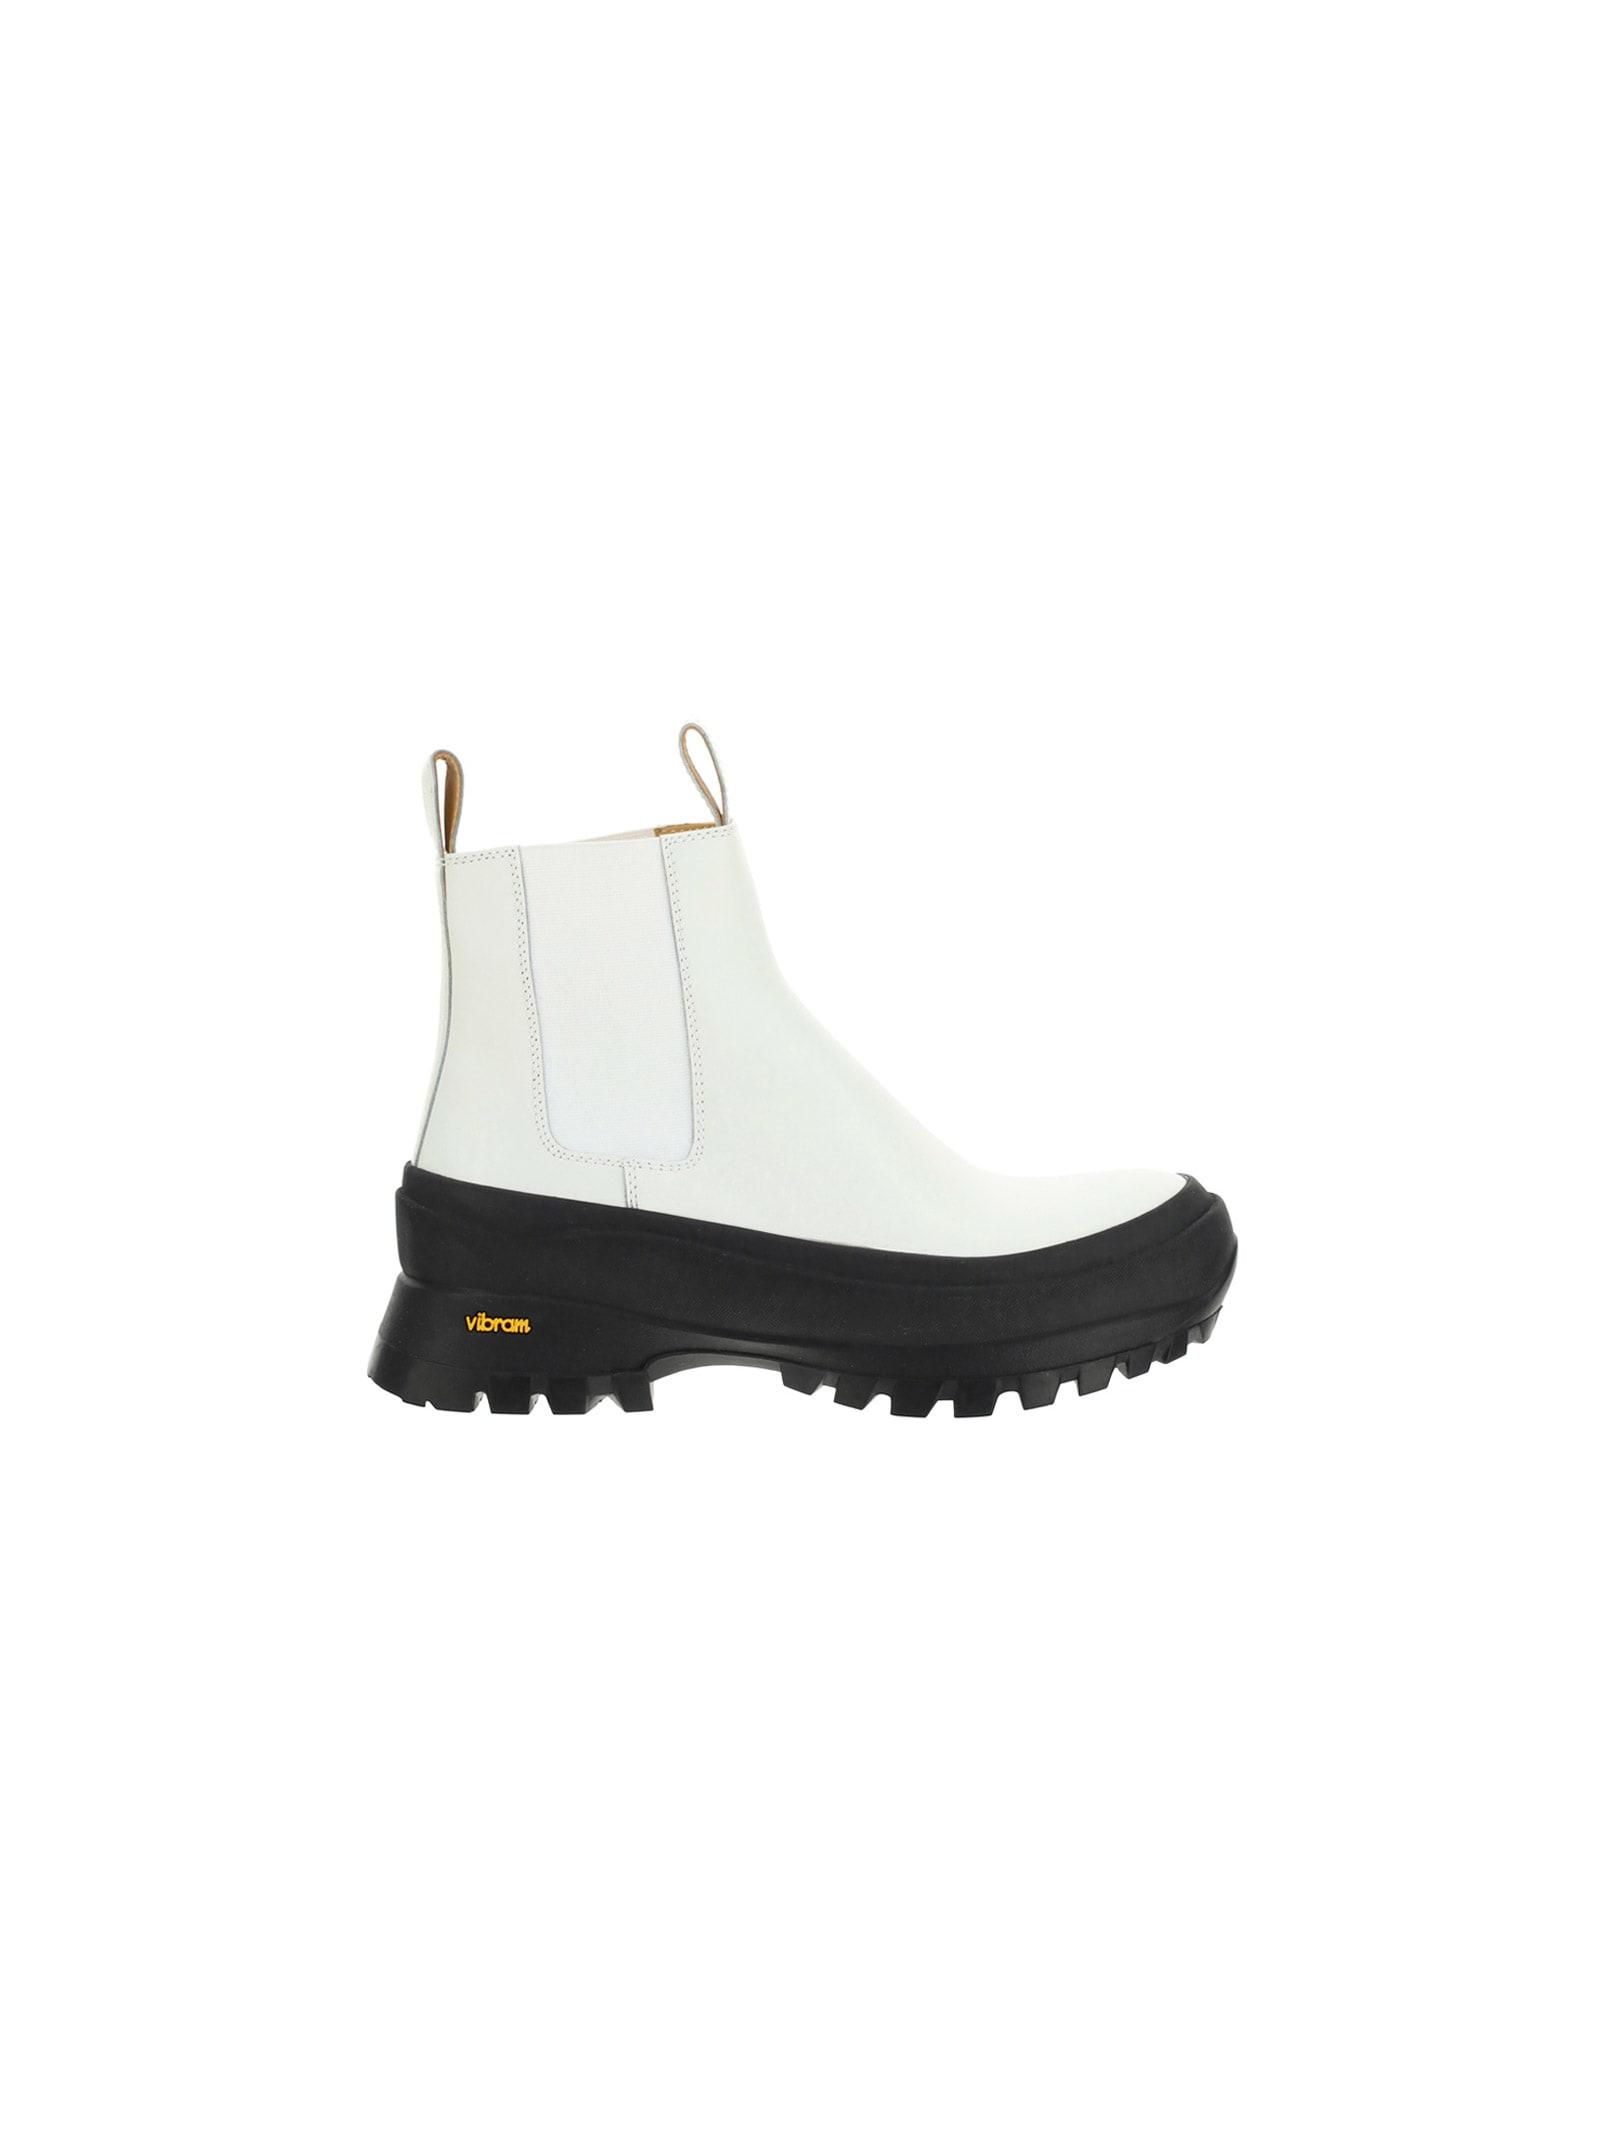 Buy Jil Sander Ankle Boot online, shop Jil Sander shoes with free shipping